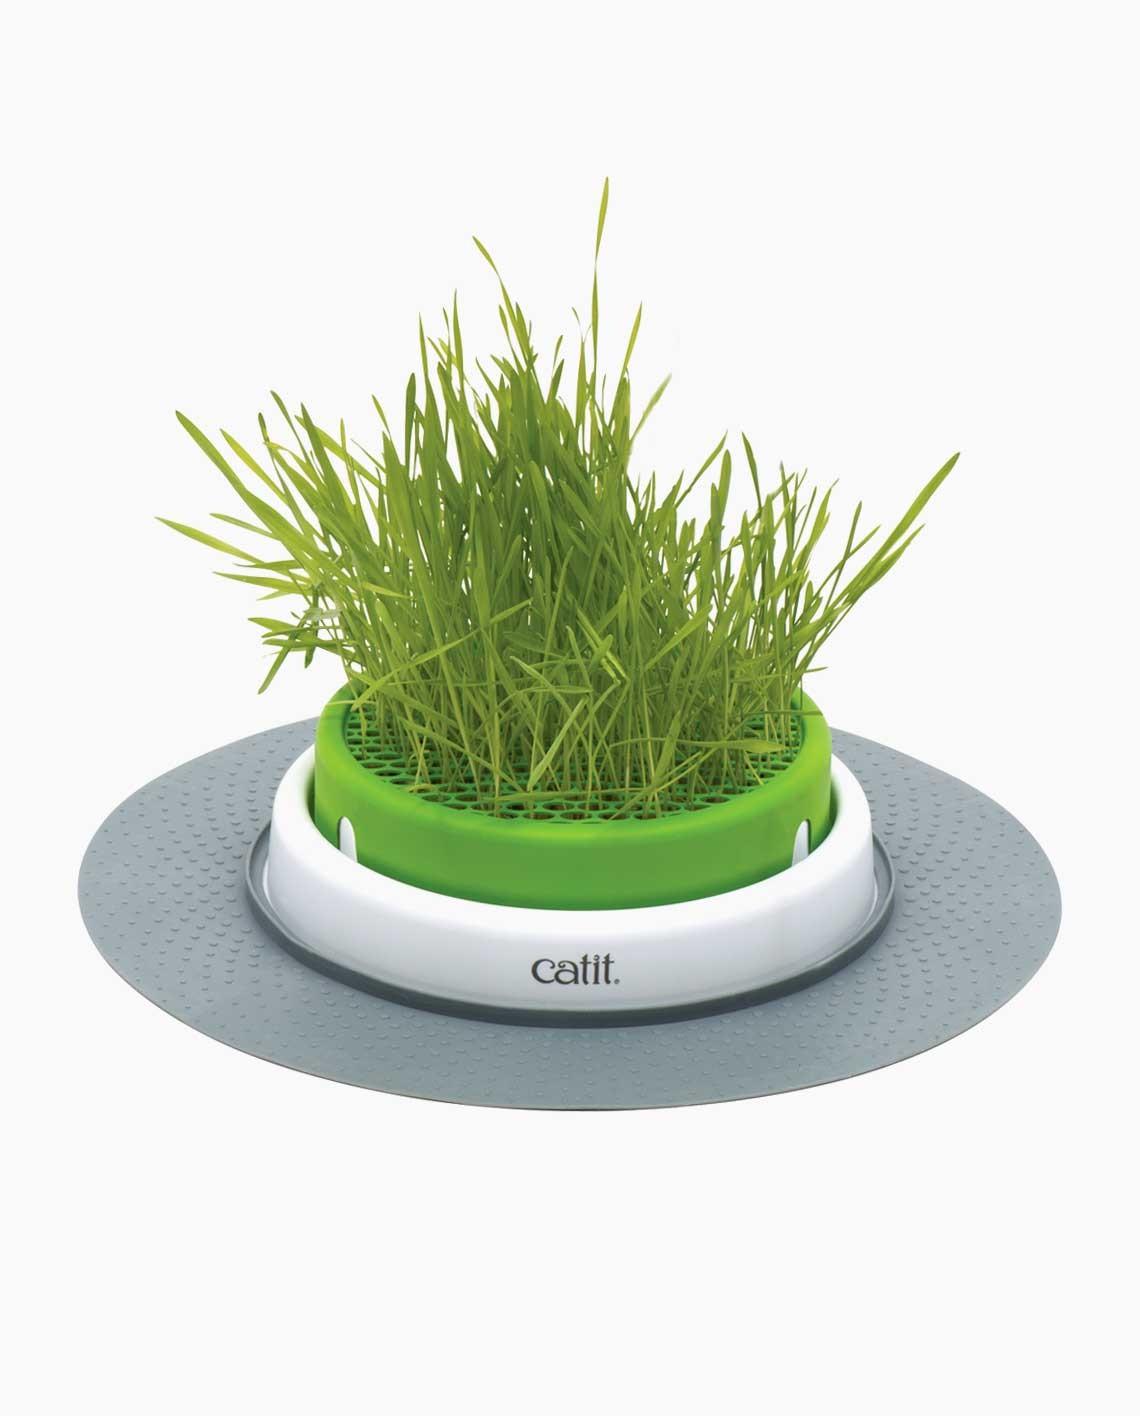 Sense 2.0 Grass Planter